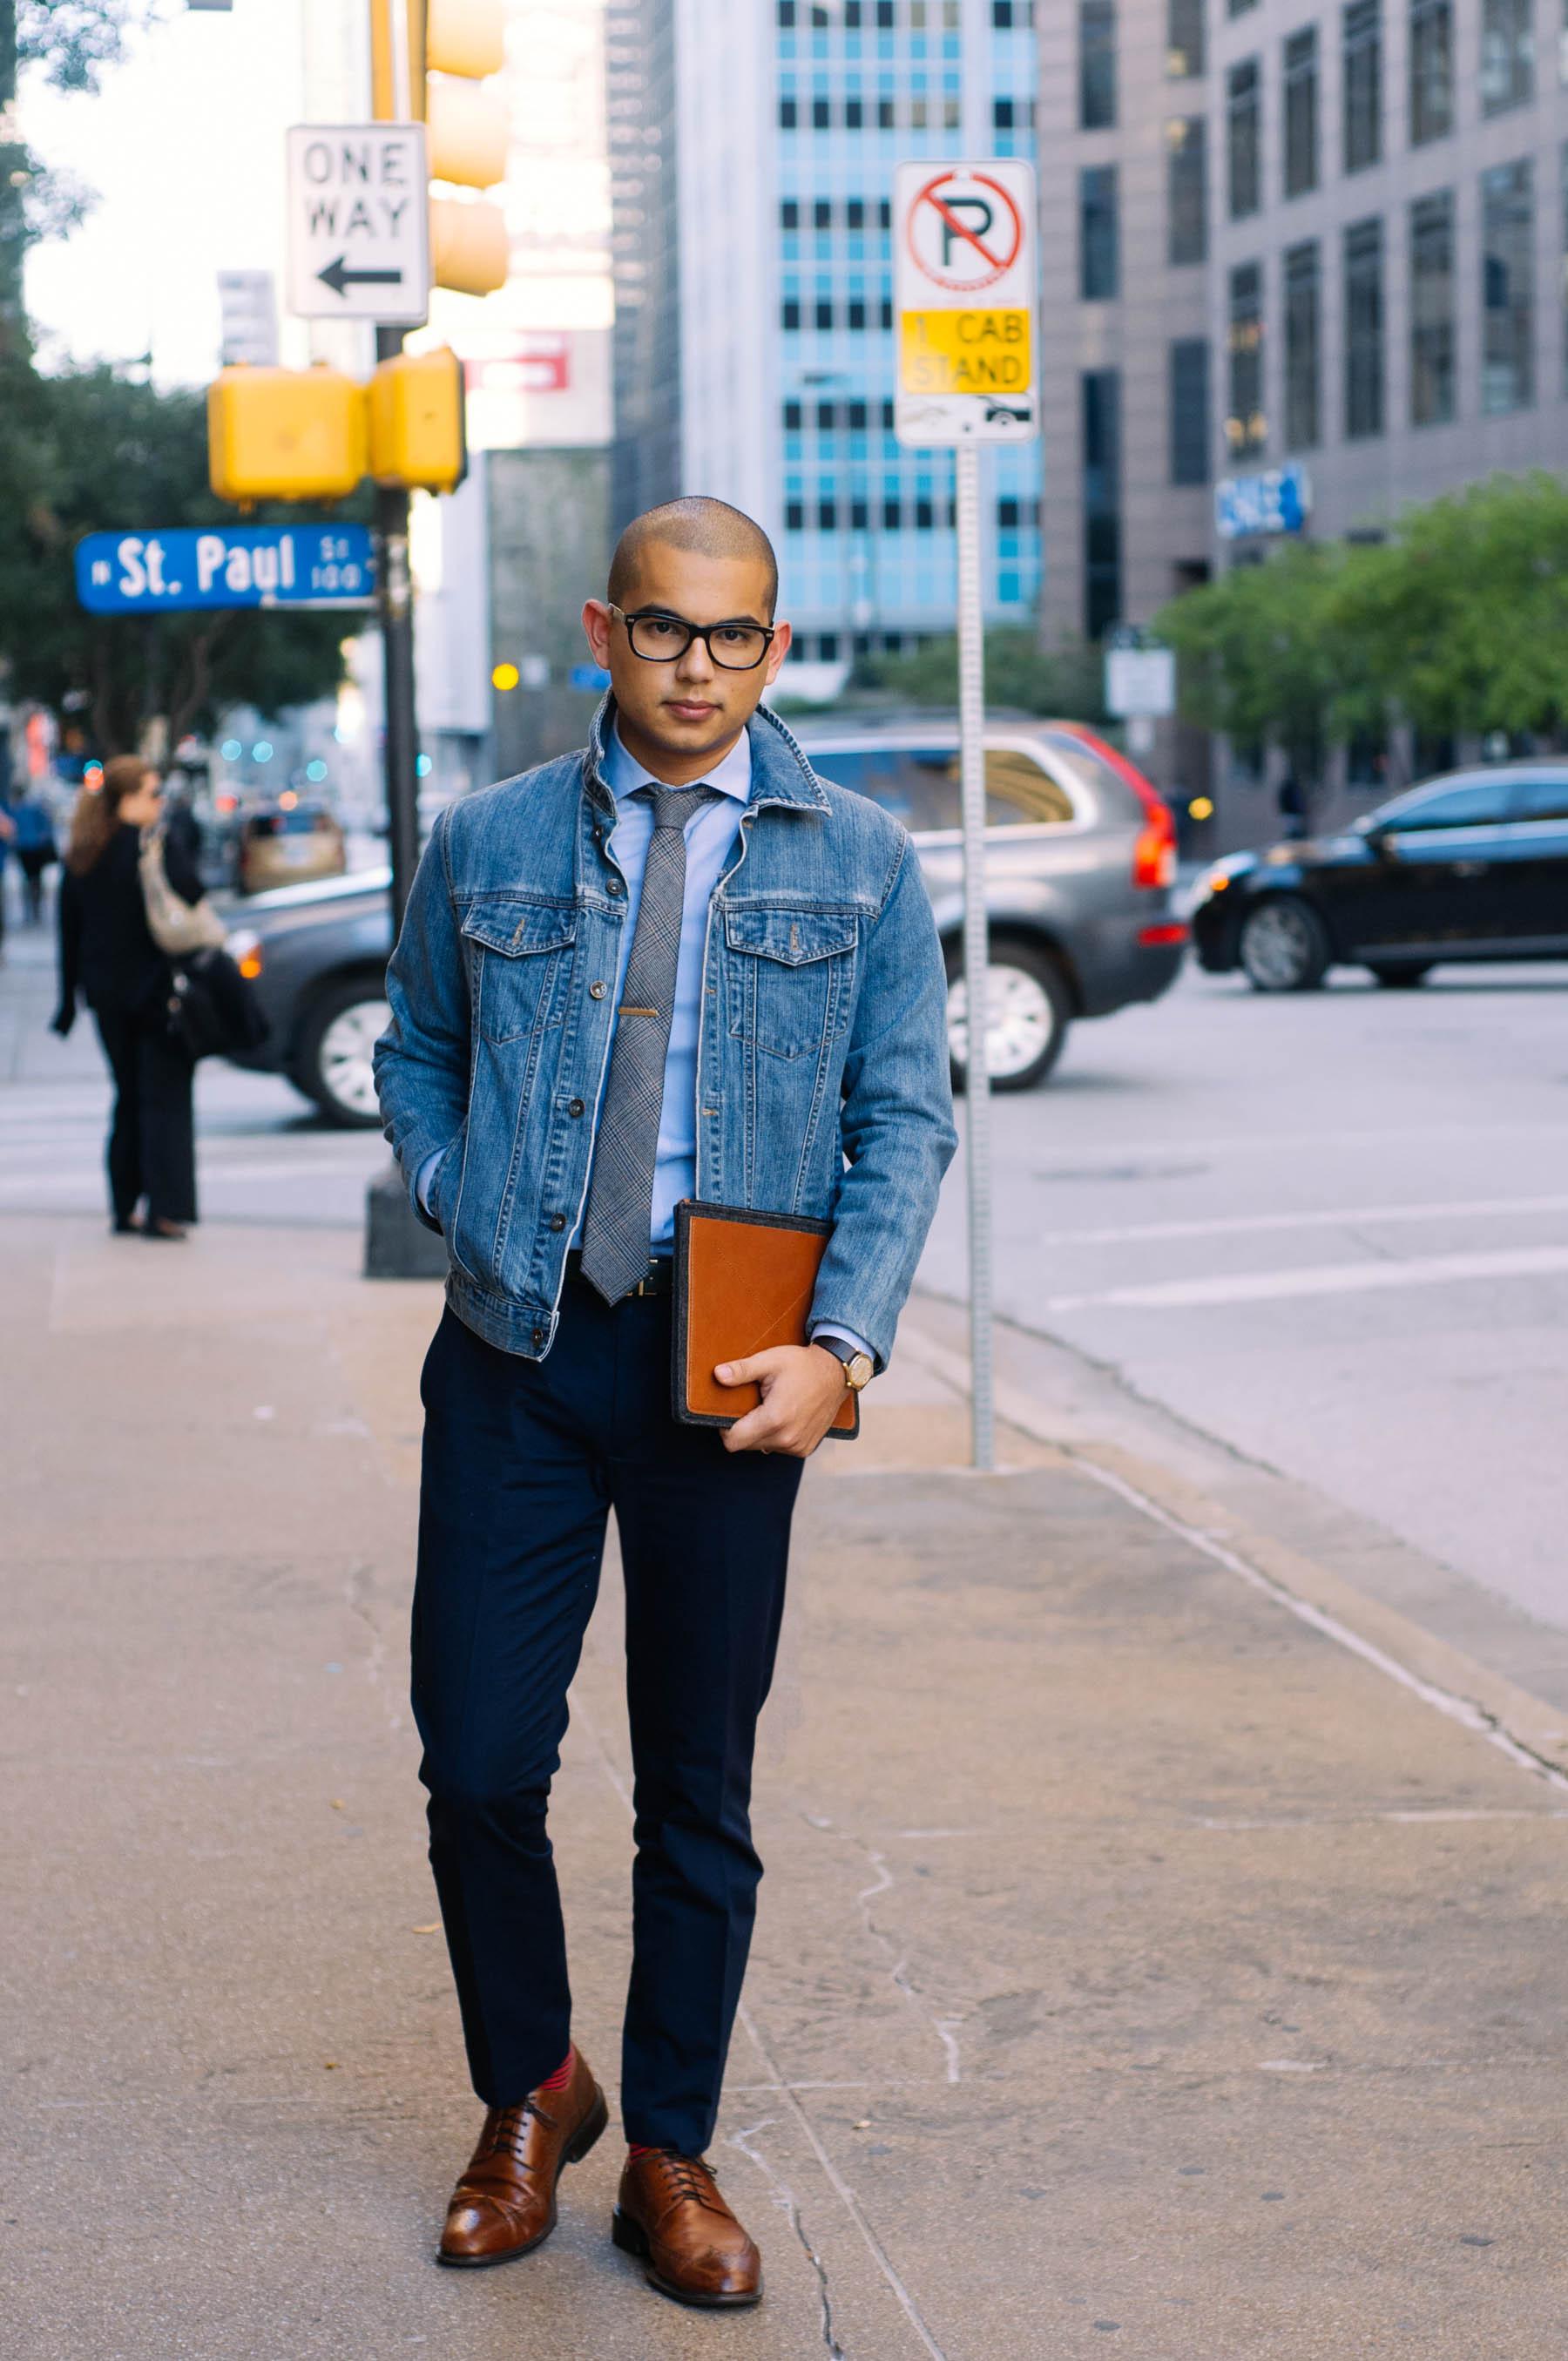 Jacket: Vintage | Pants: J.Crew | Shirt: H&M | Tie: The Tie Bar | Tie Clip: The Tie Bar | Belt: American Apparel | Shoes: Cole Haan | Socks: J.Crew | Glasses: Warby Parker | Watch: Omega